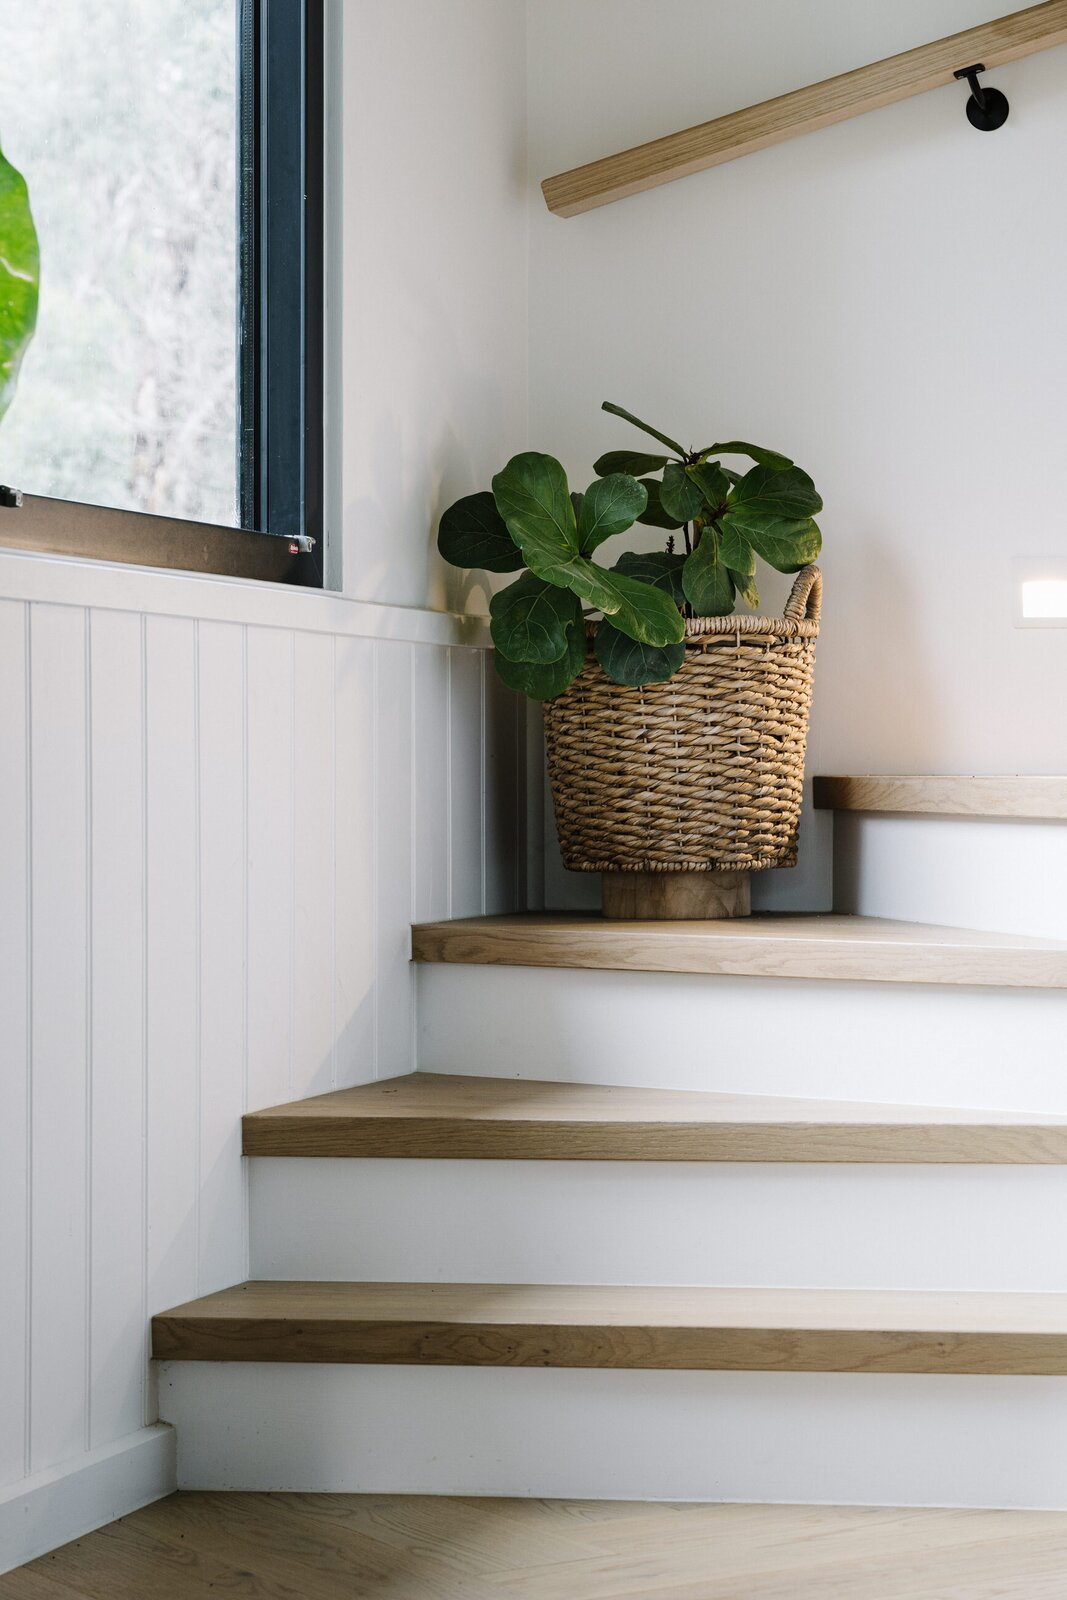 Stairs of Blair Street by Sanctum Homes